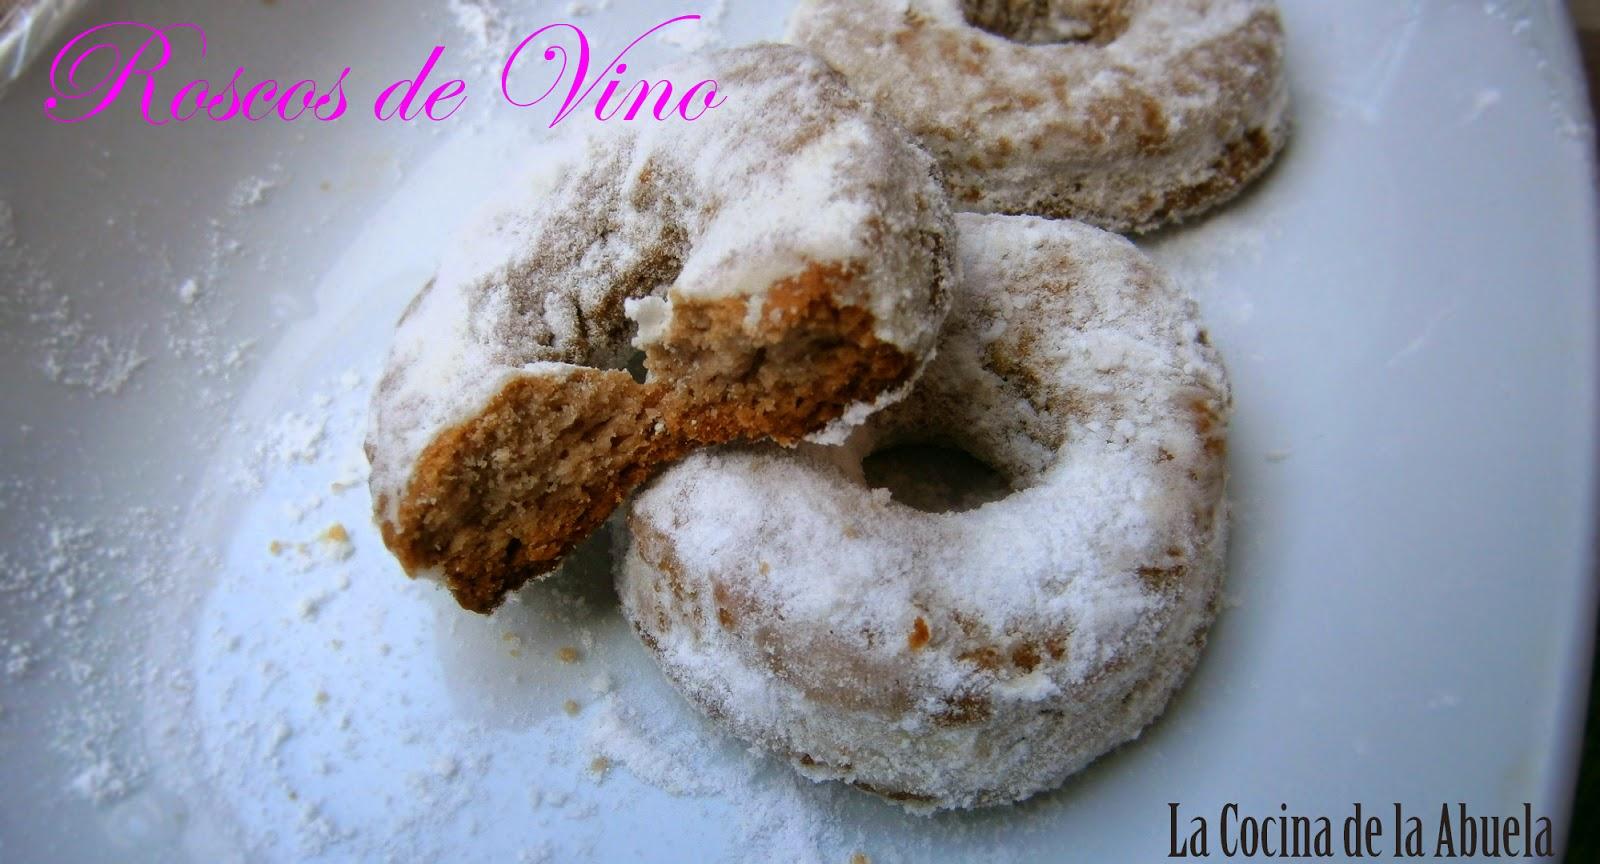 Roscos de Vino.